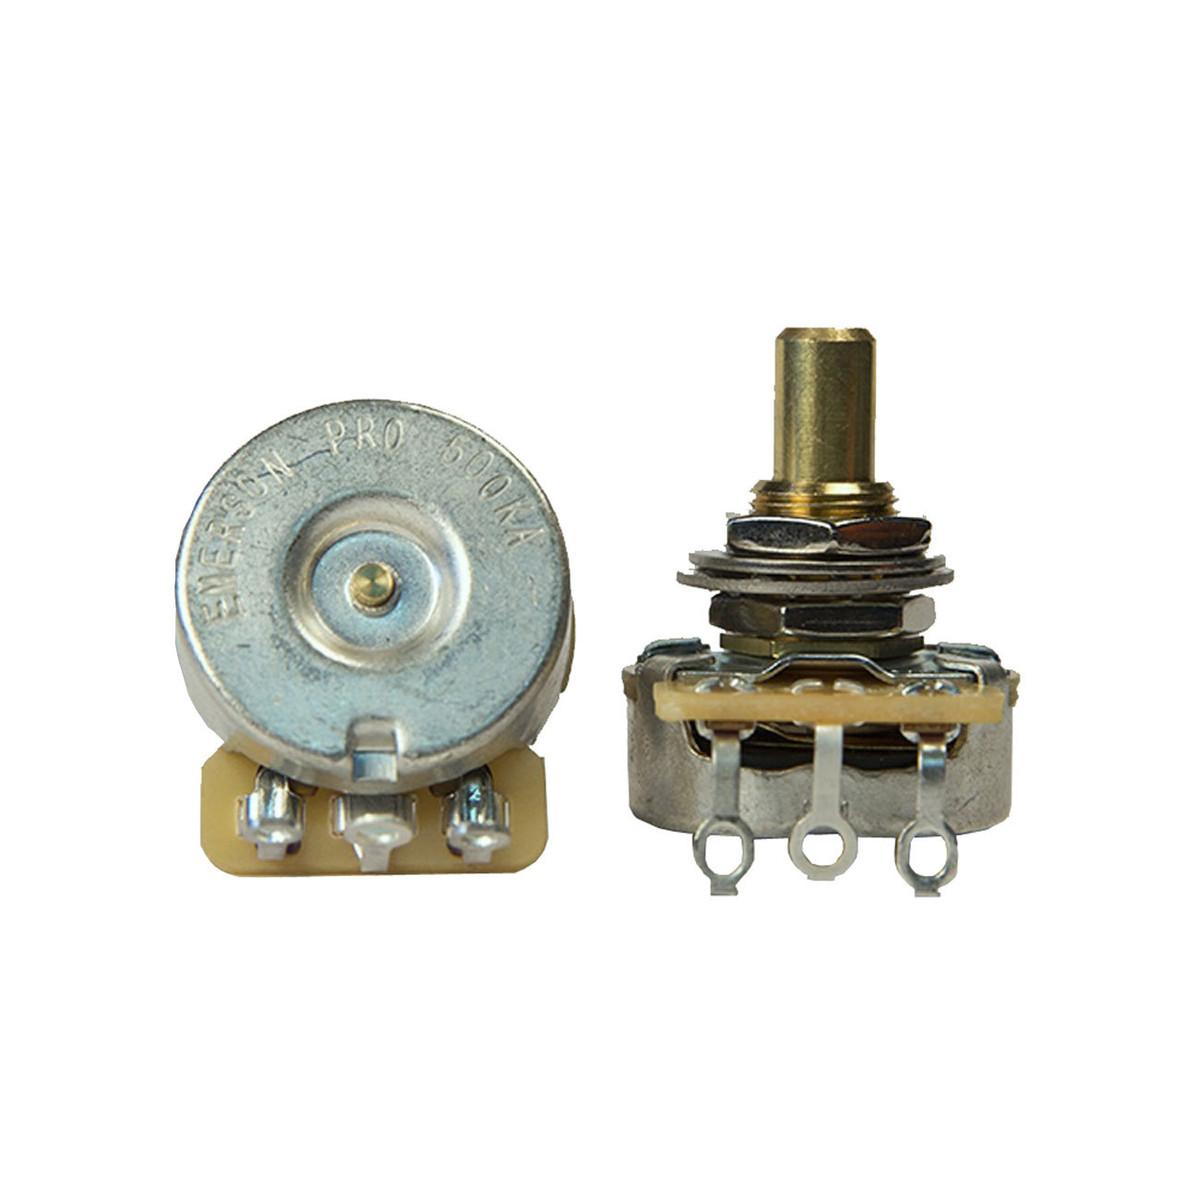 Image of Emerson Custom CTS 500K Short Solid Shaft Pro Potentiometer